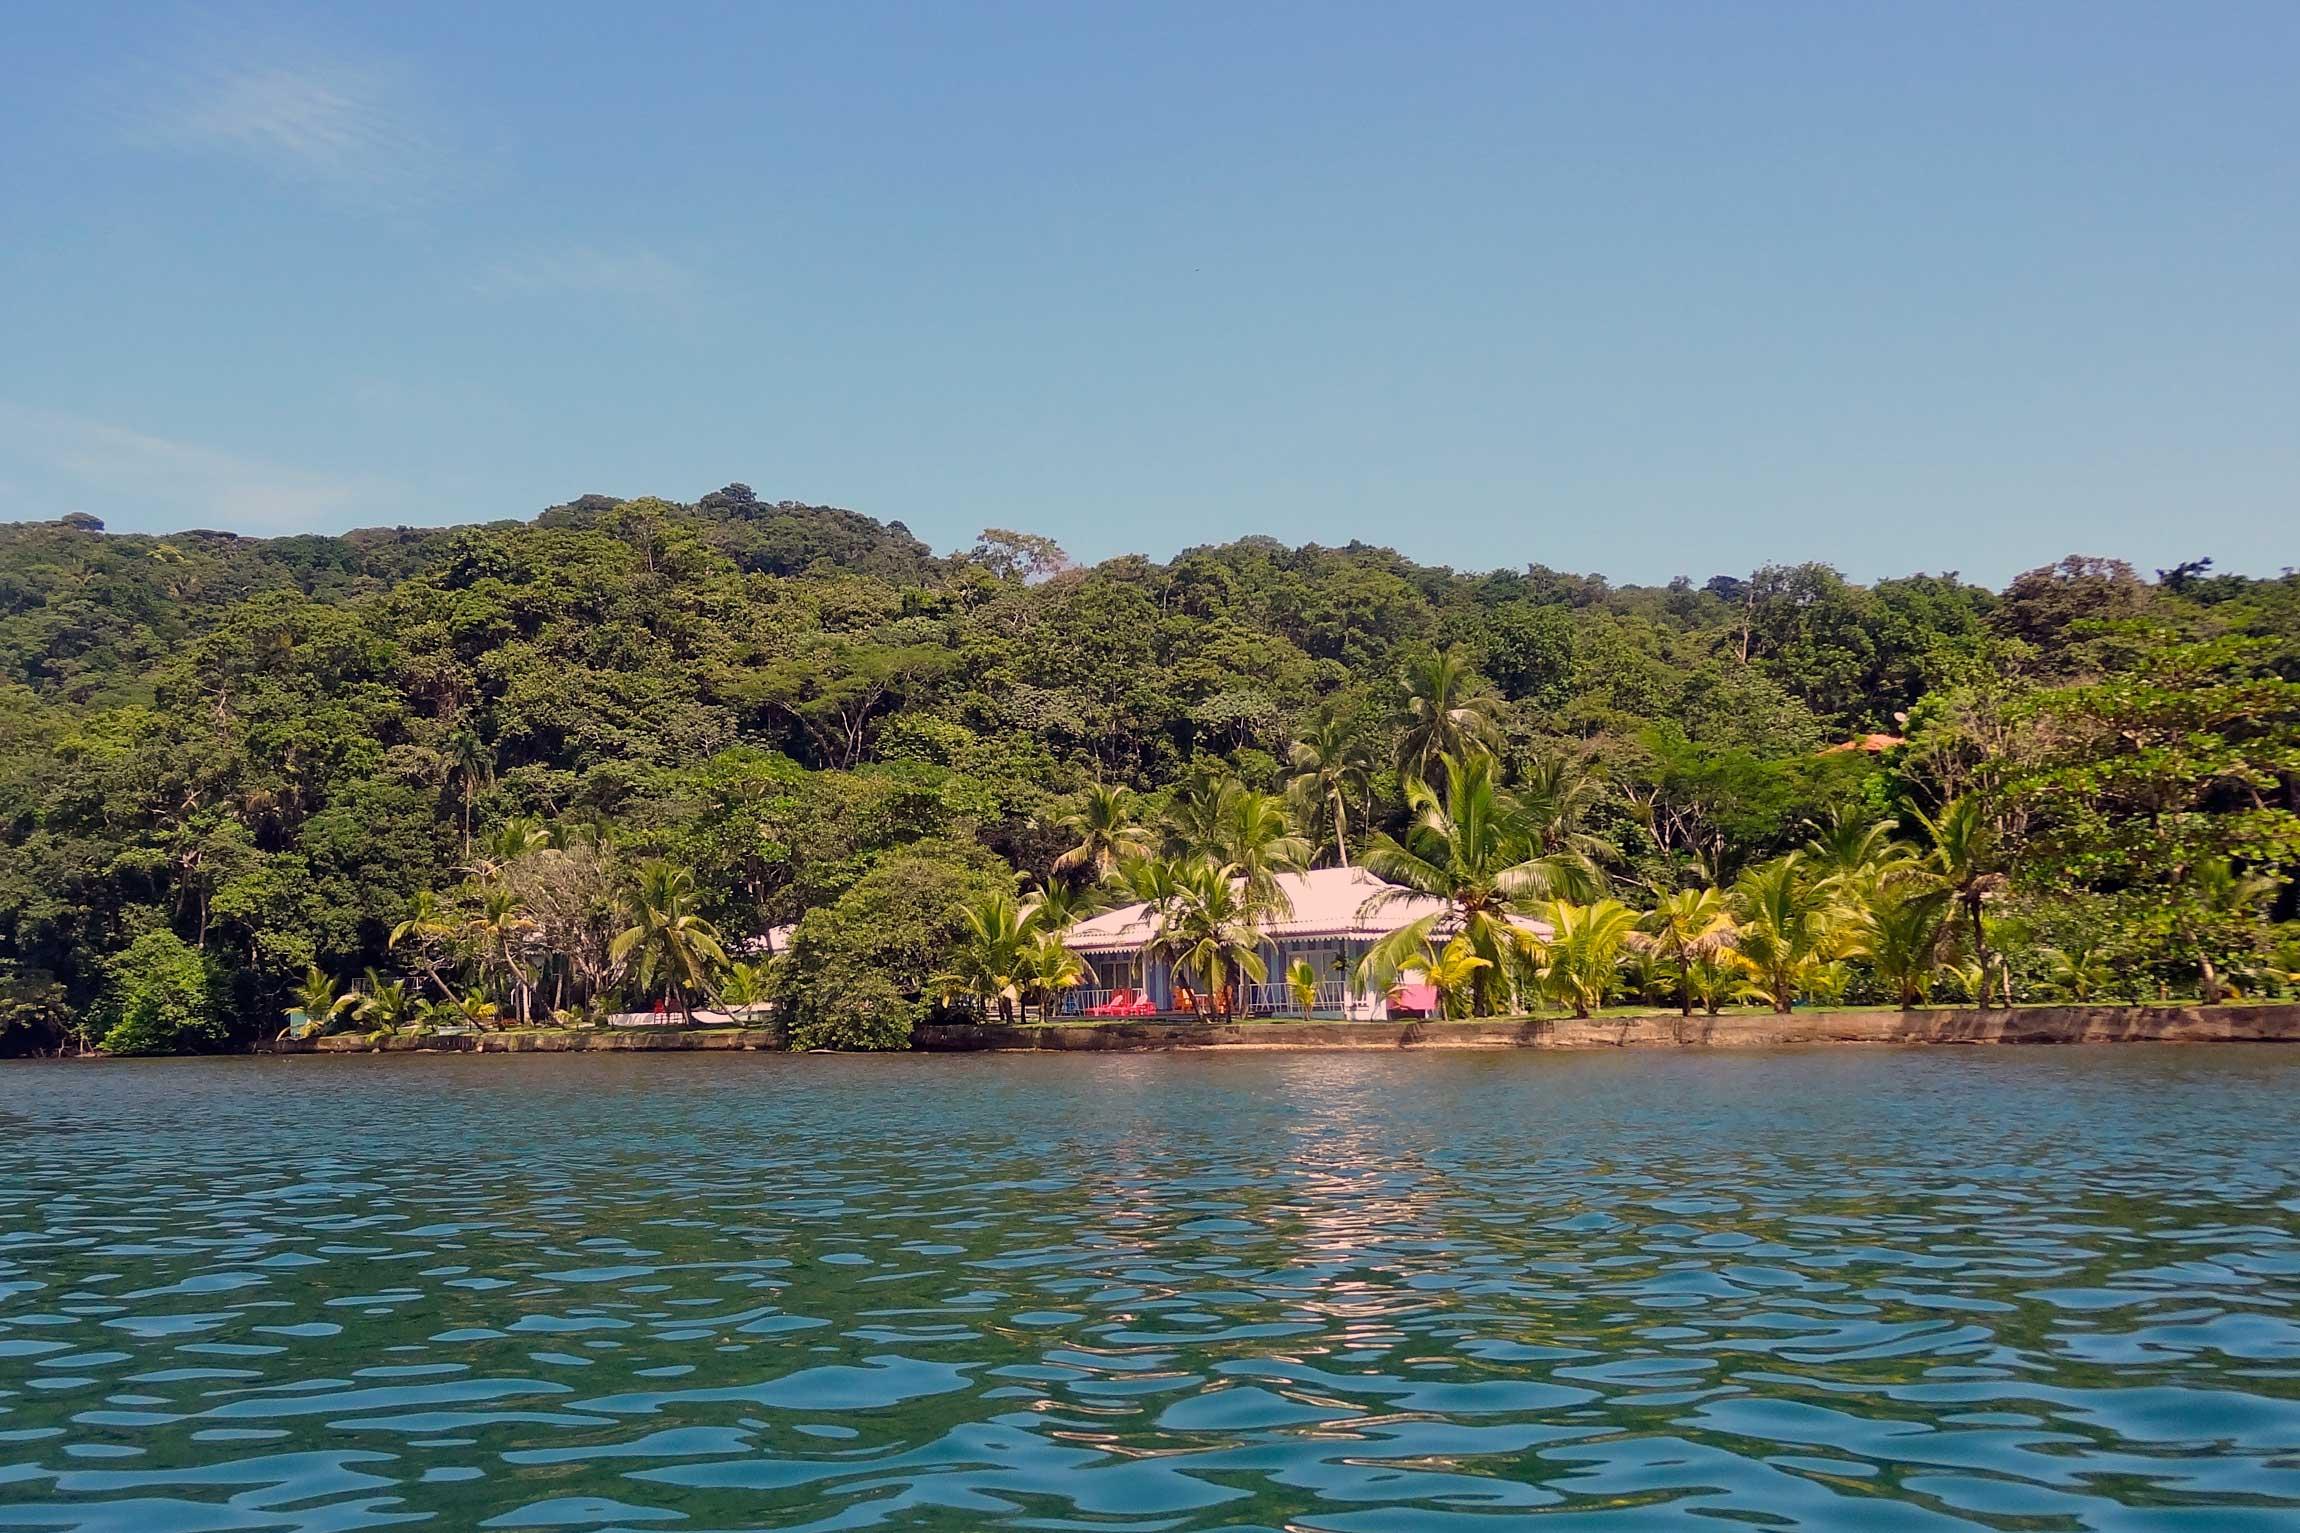 Panama-Wildlife-Tours-El-Otro-Lado-Exterior